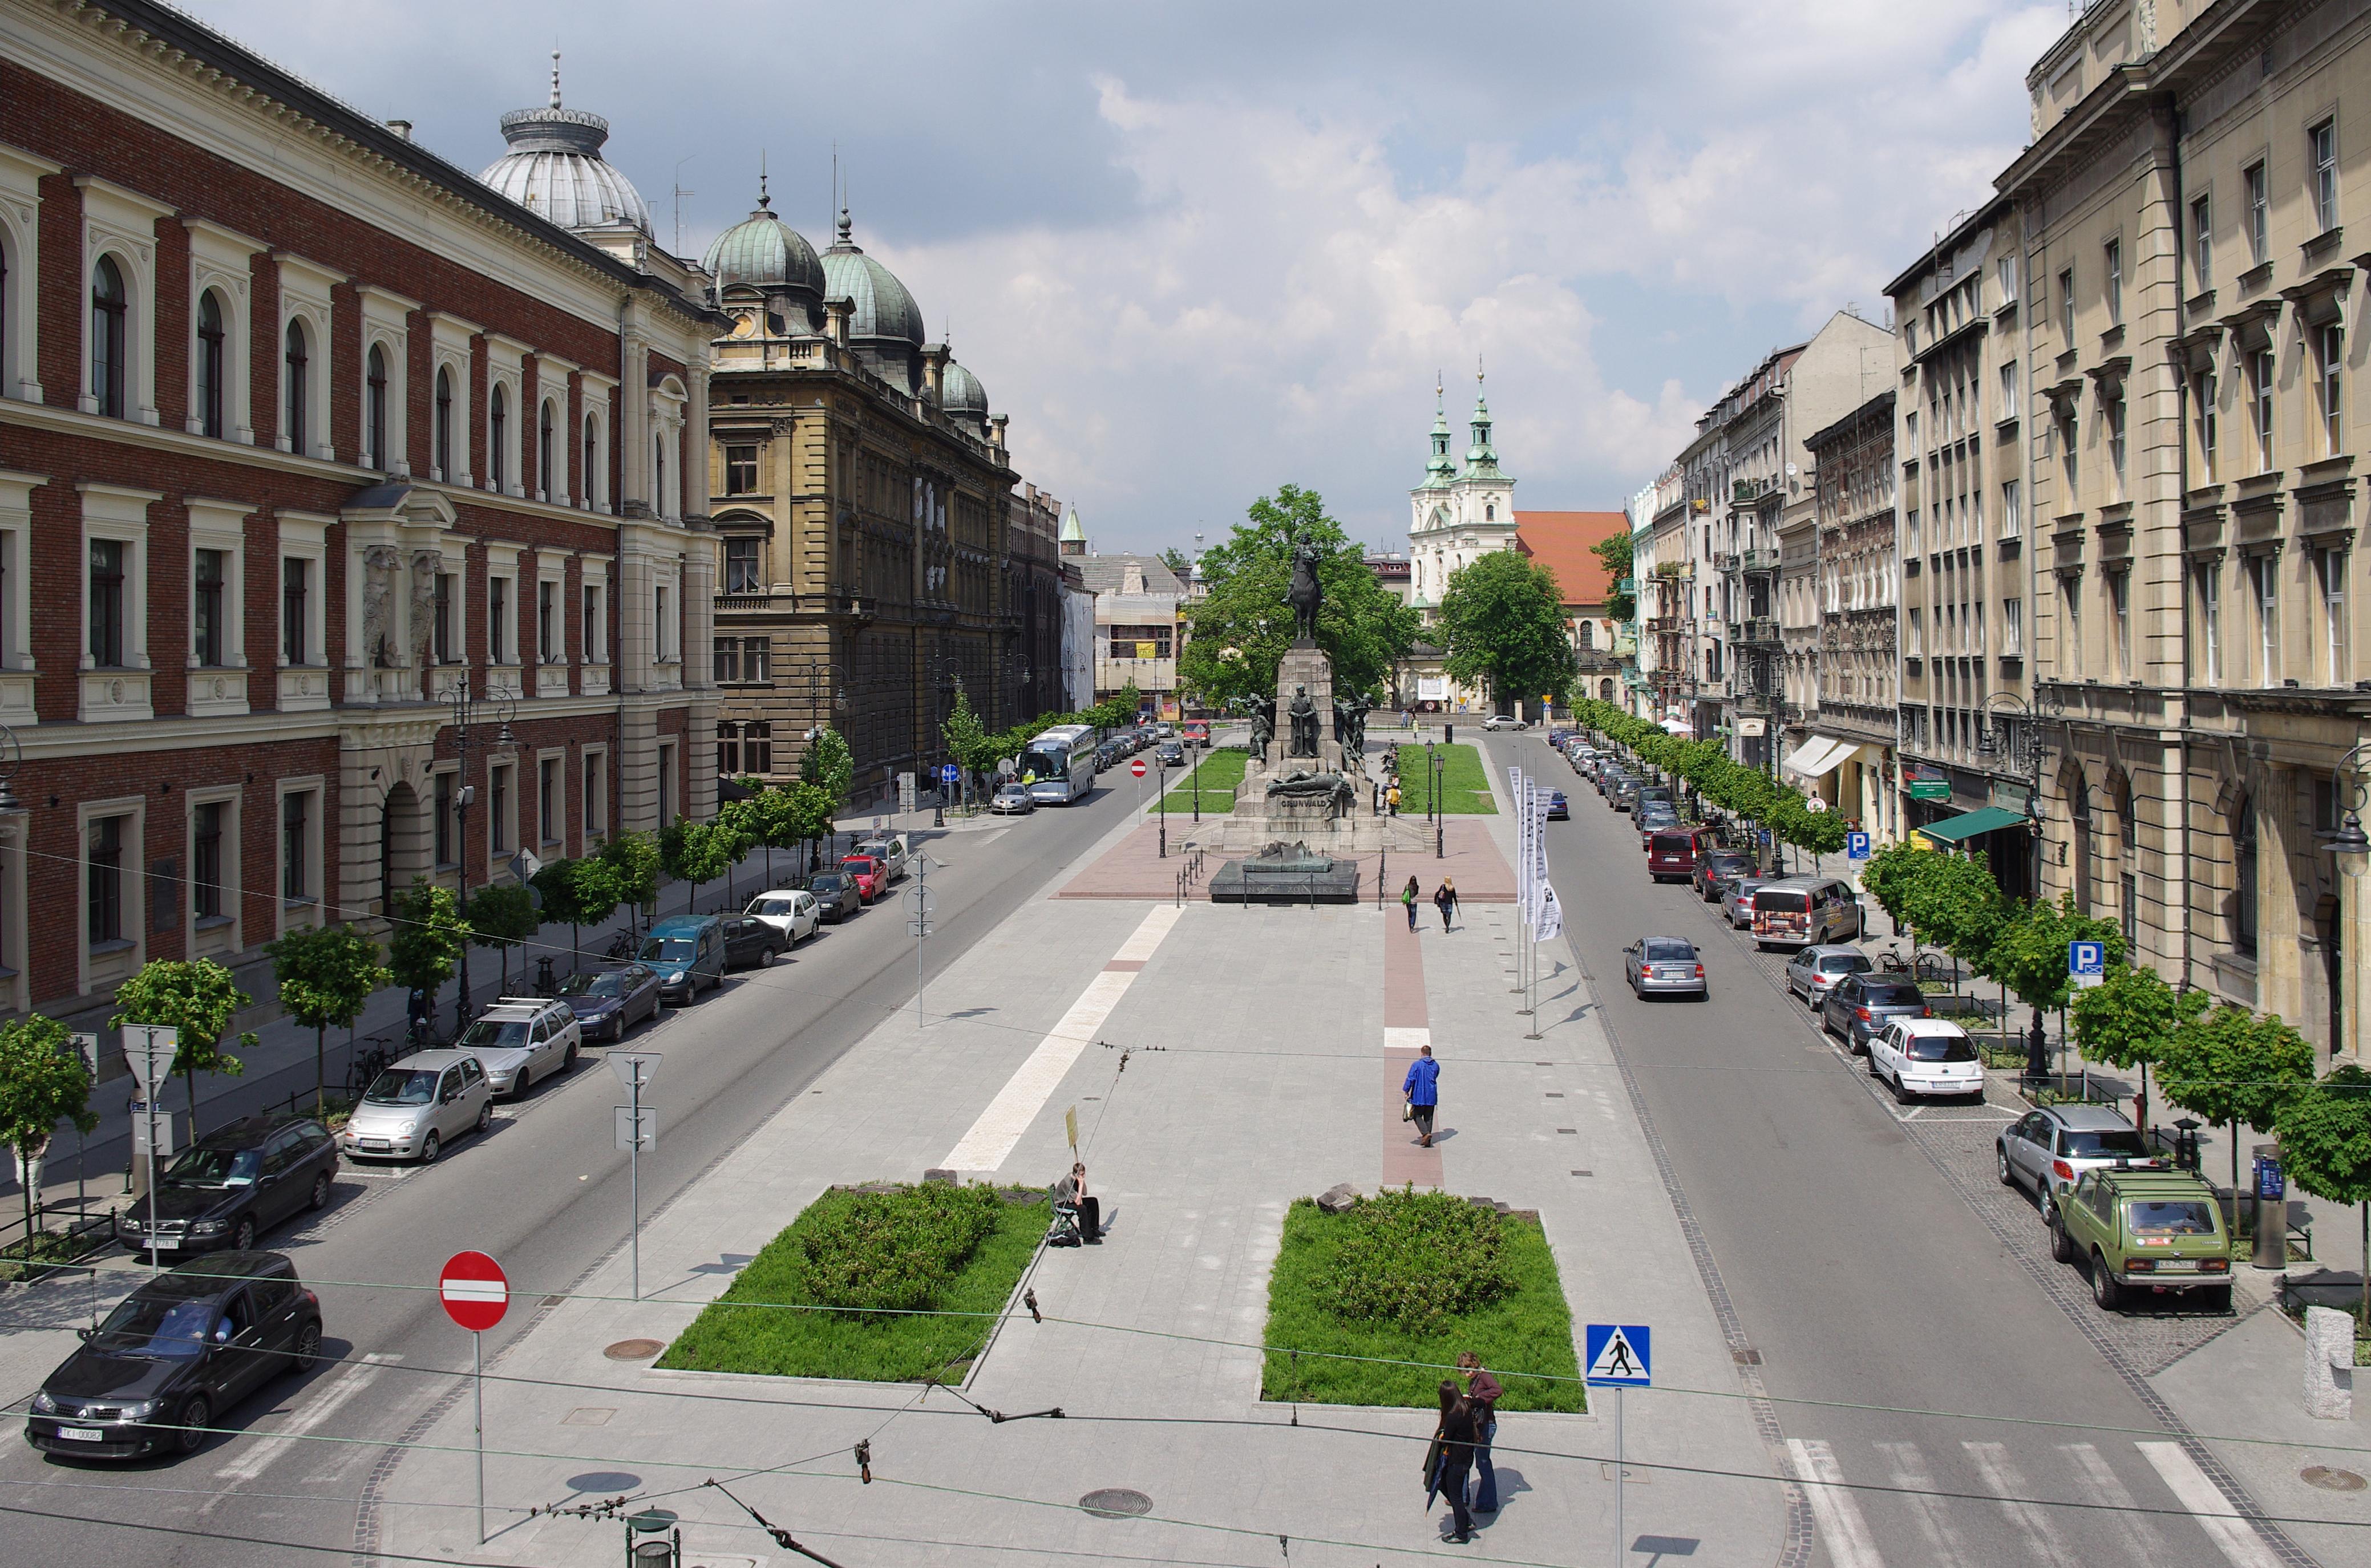 ¿Cuáles son algunos lugares históricos famosos o importantes para visitar en Polonia